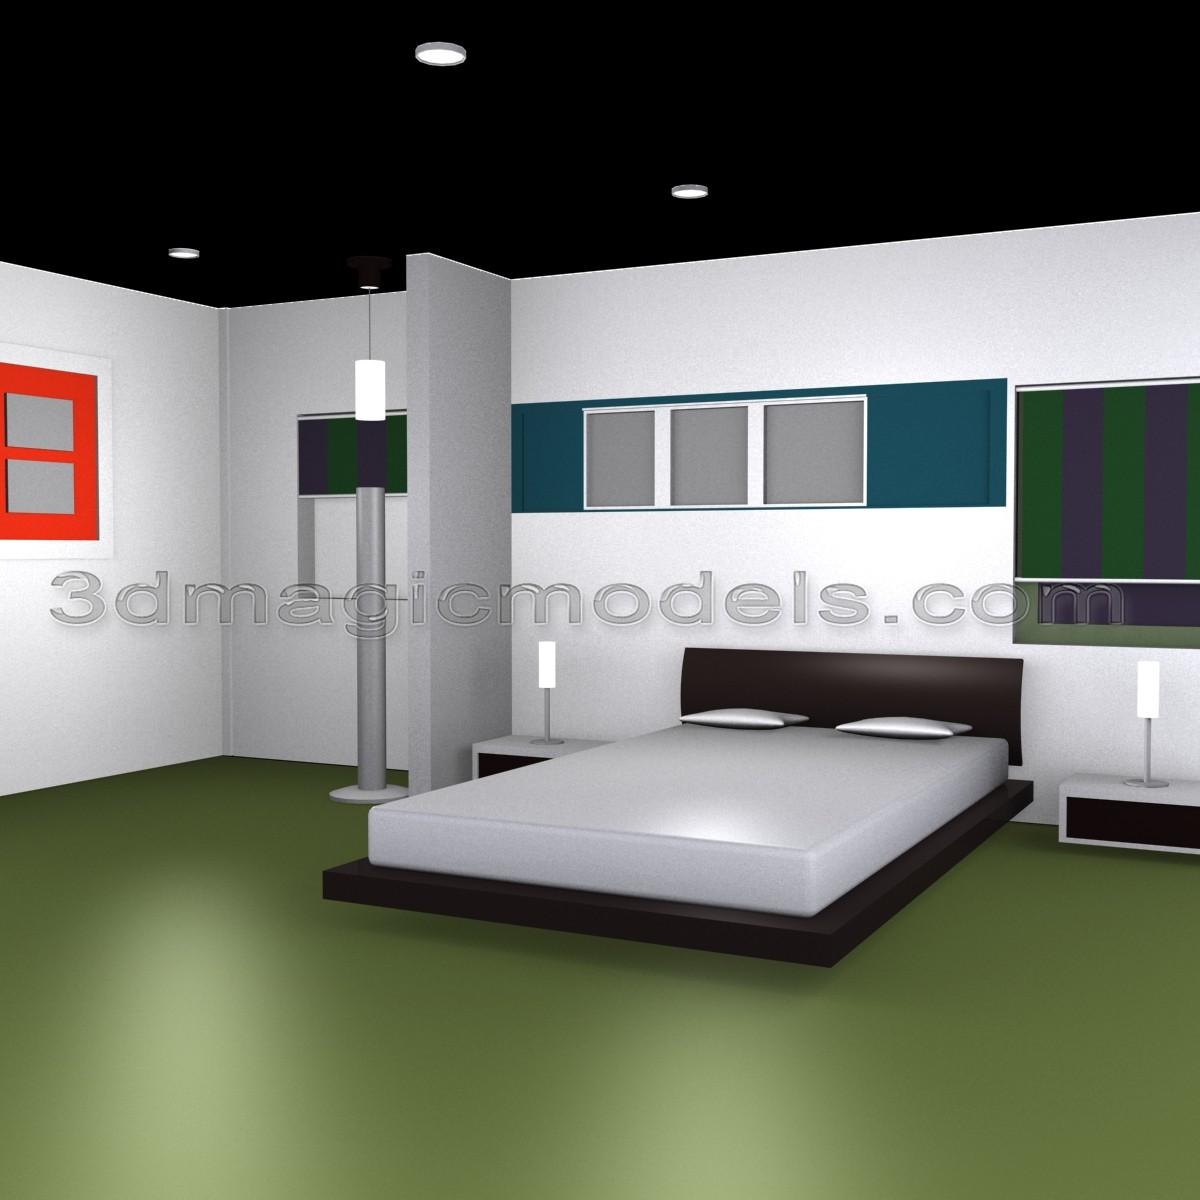 best design wallpapers modern bedroom develop into one of 1200x1200